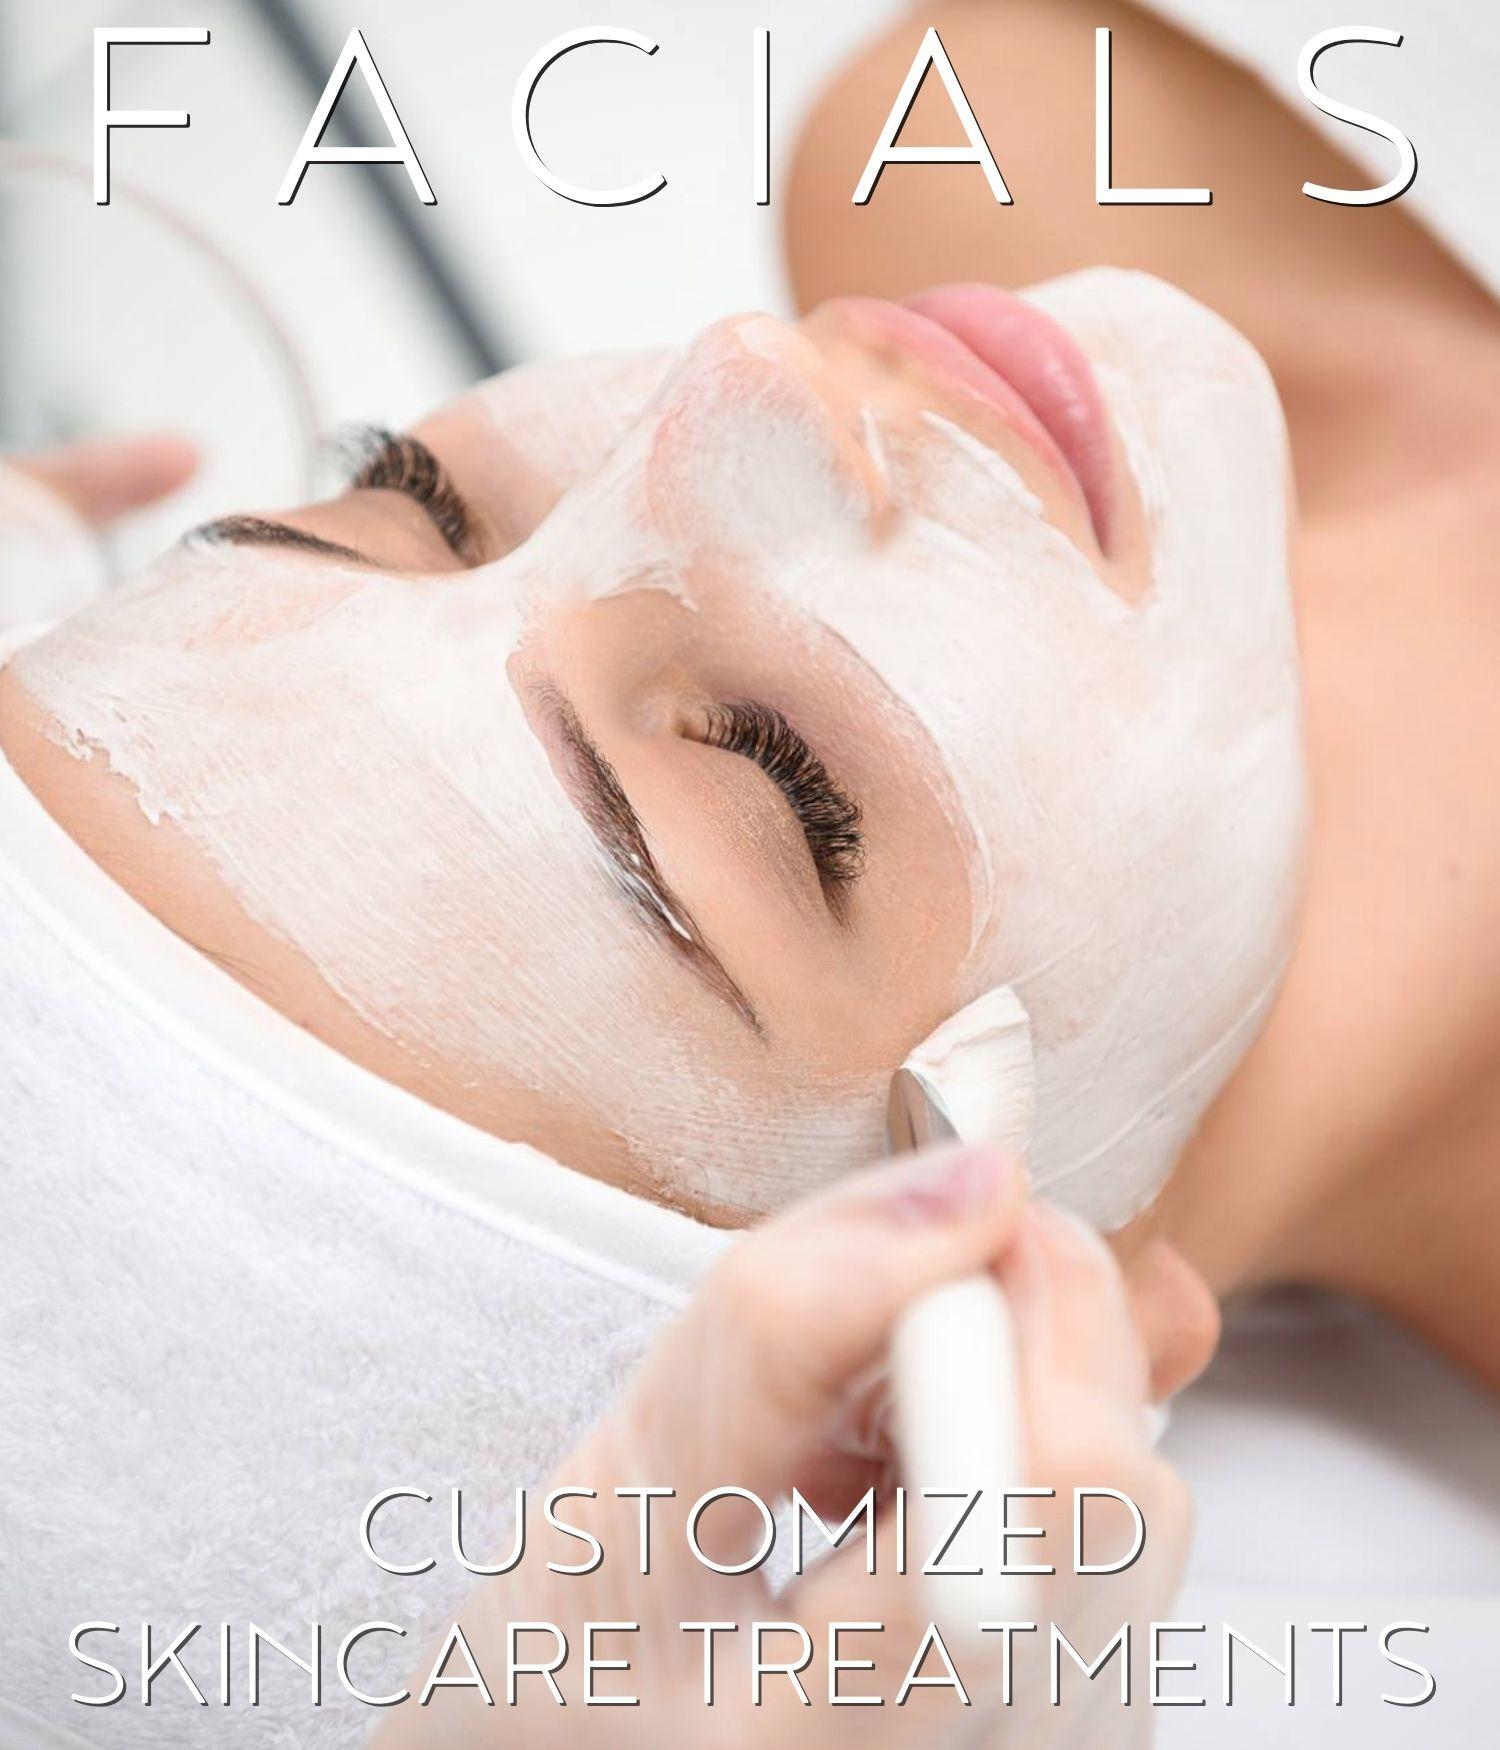 woman having facials treatment promoting customized skincare